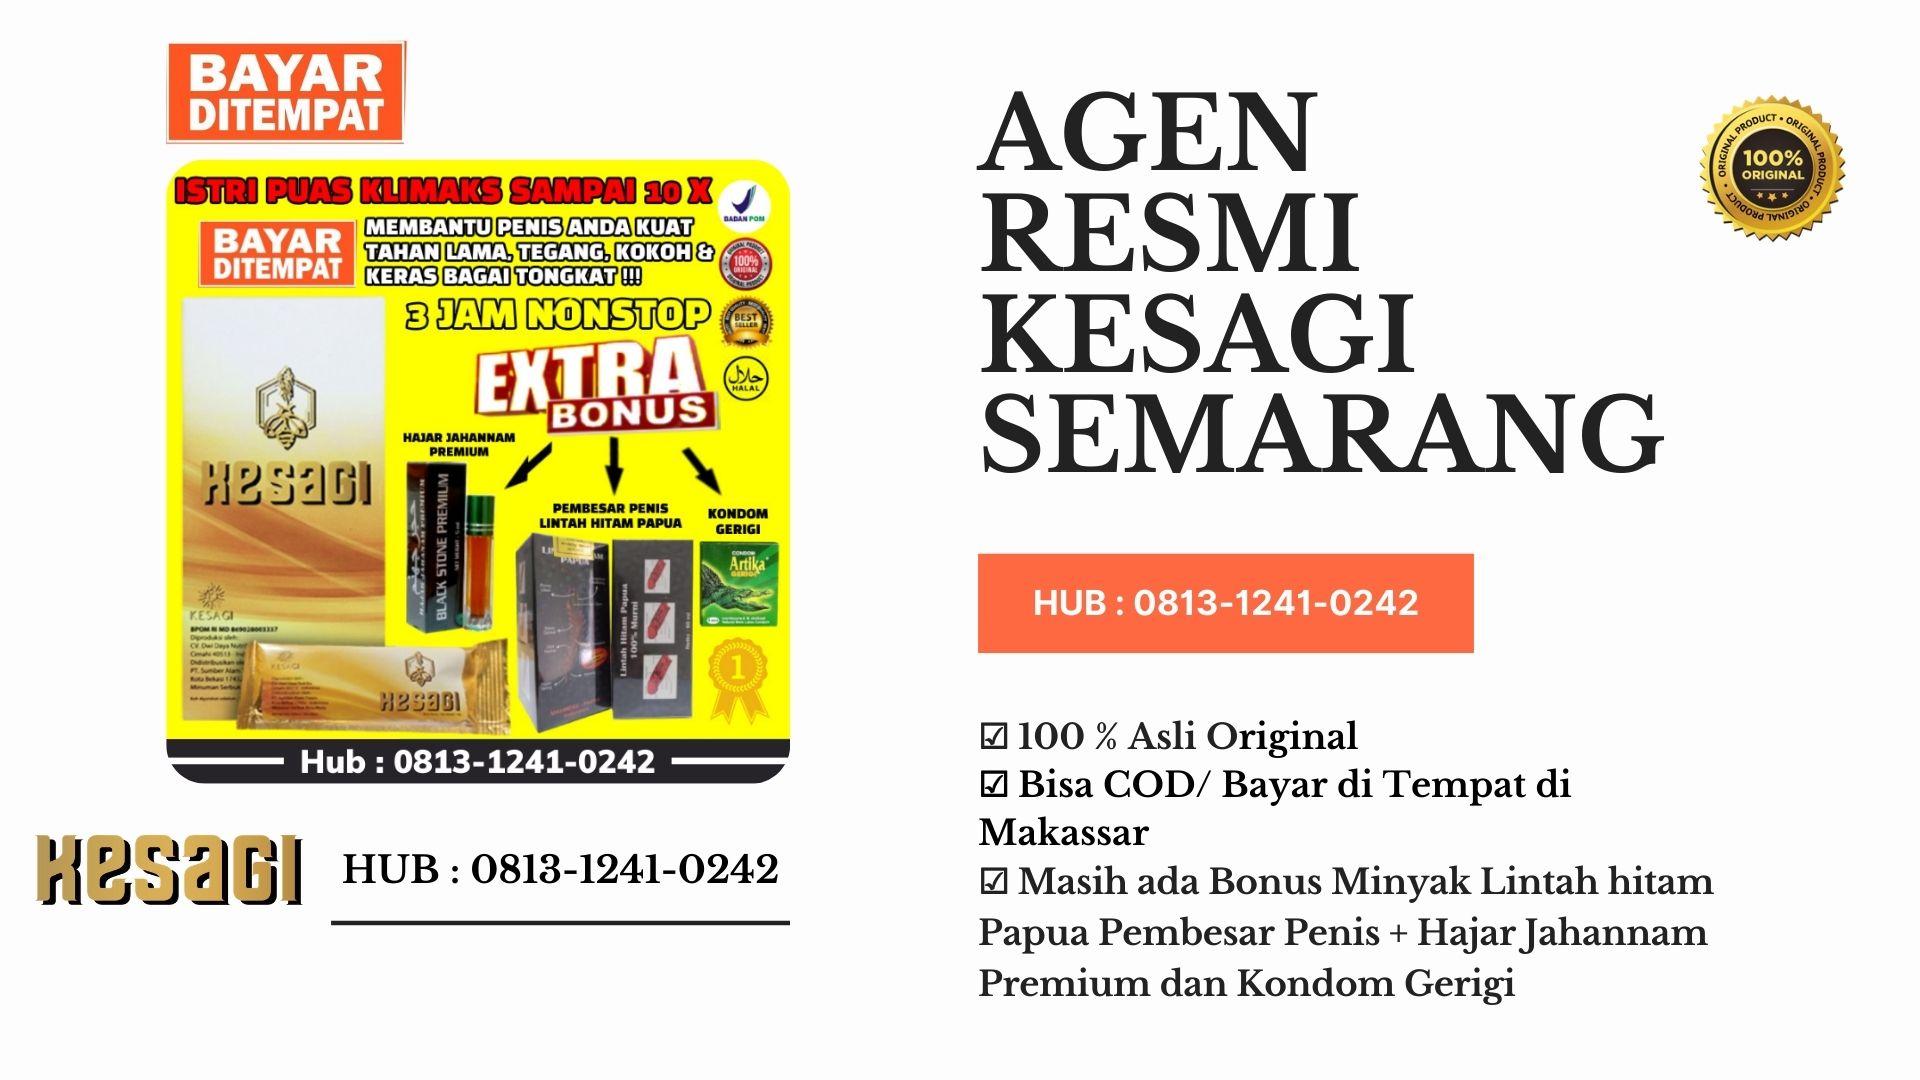 Agen Resmi Madu Kesagi Semarang Jawa Tengah ( Garansi Jaminan 100 % Original )